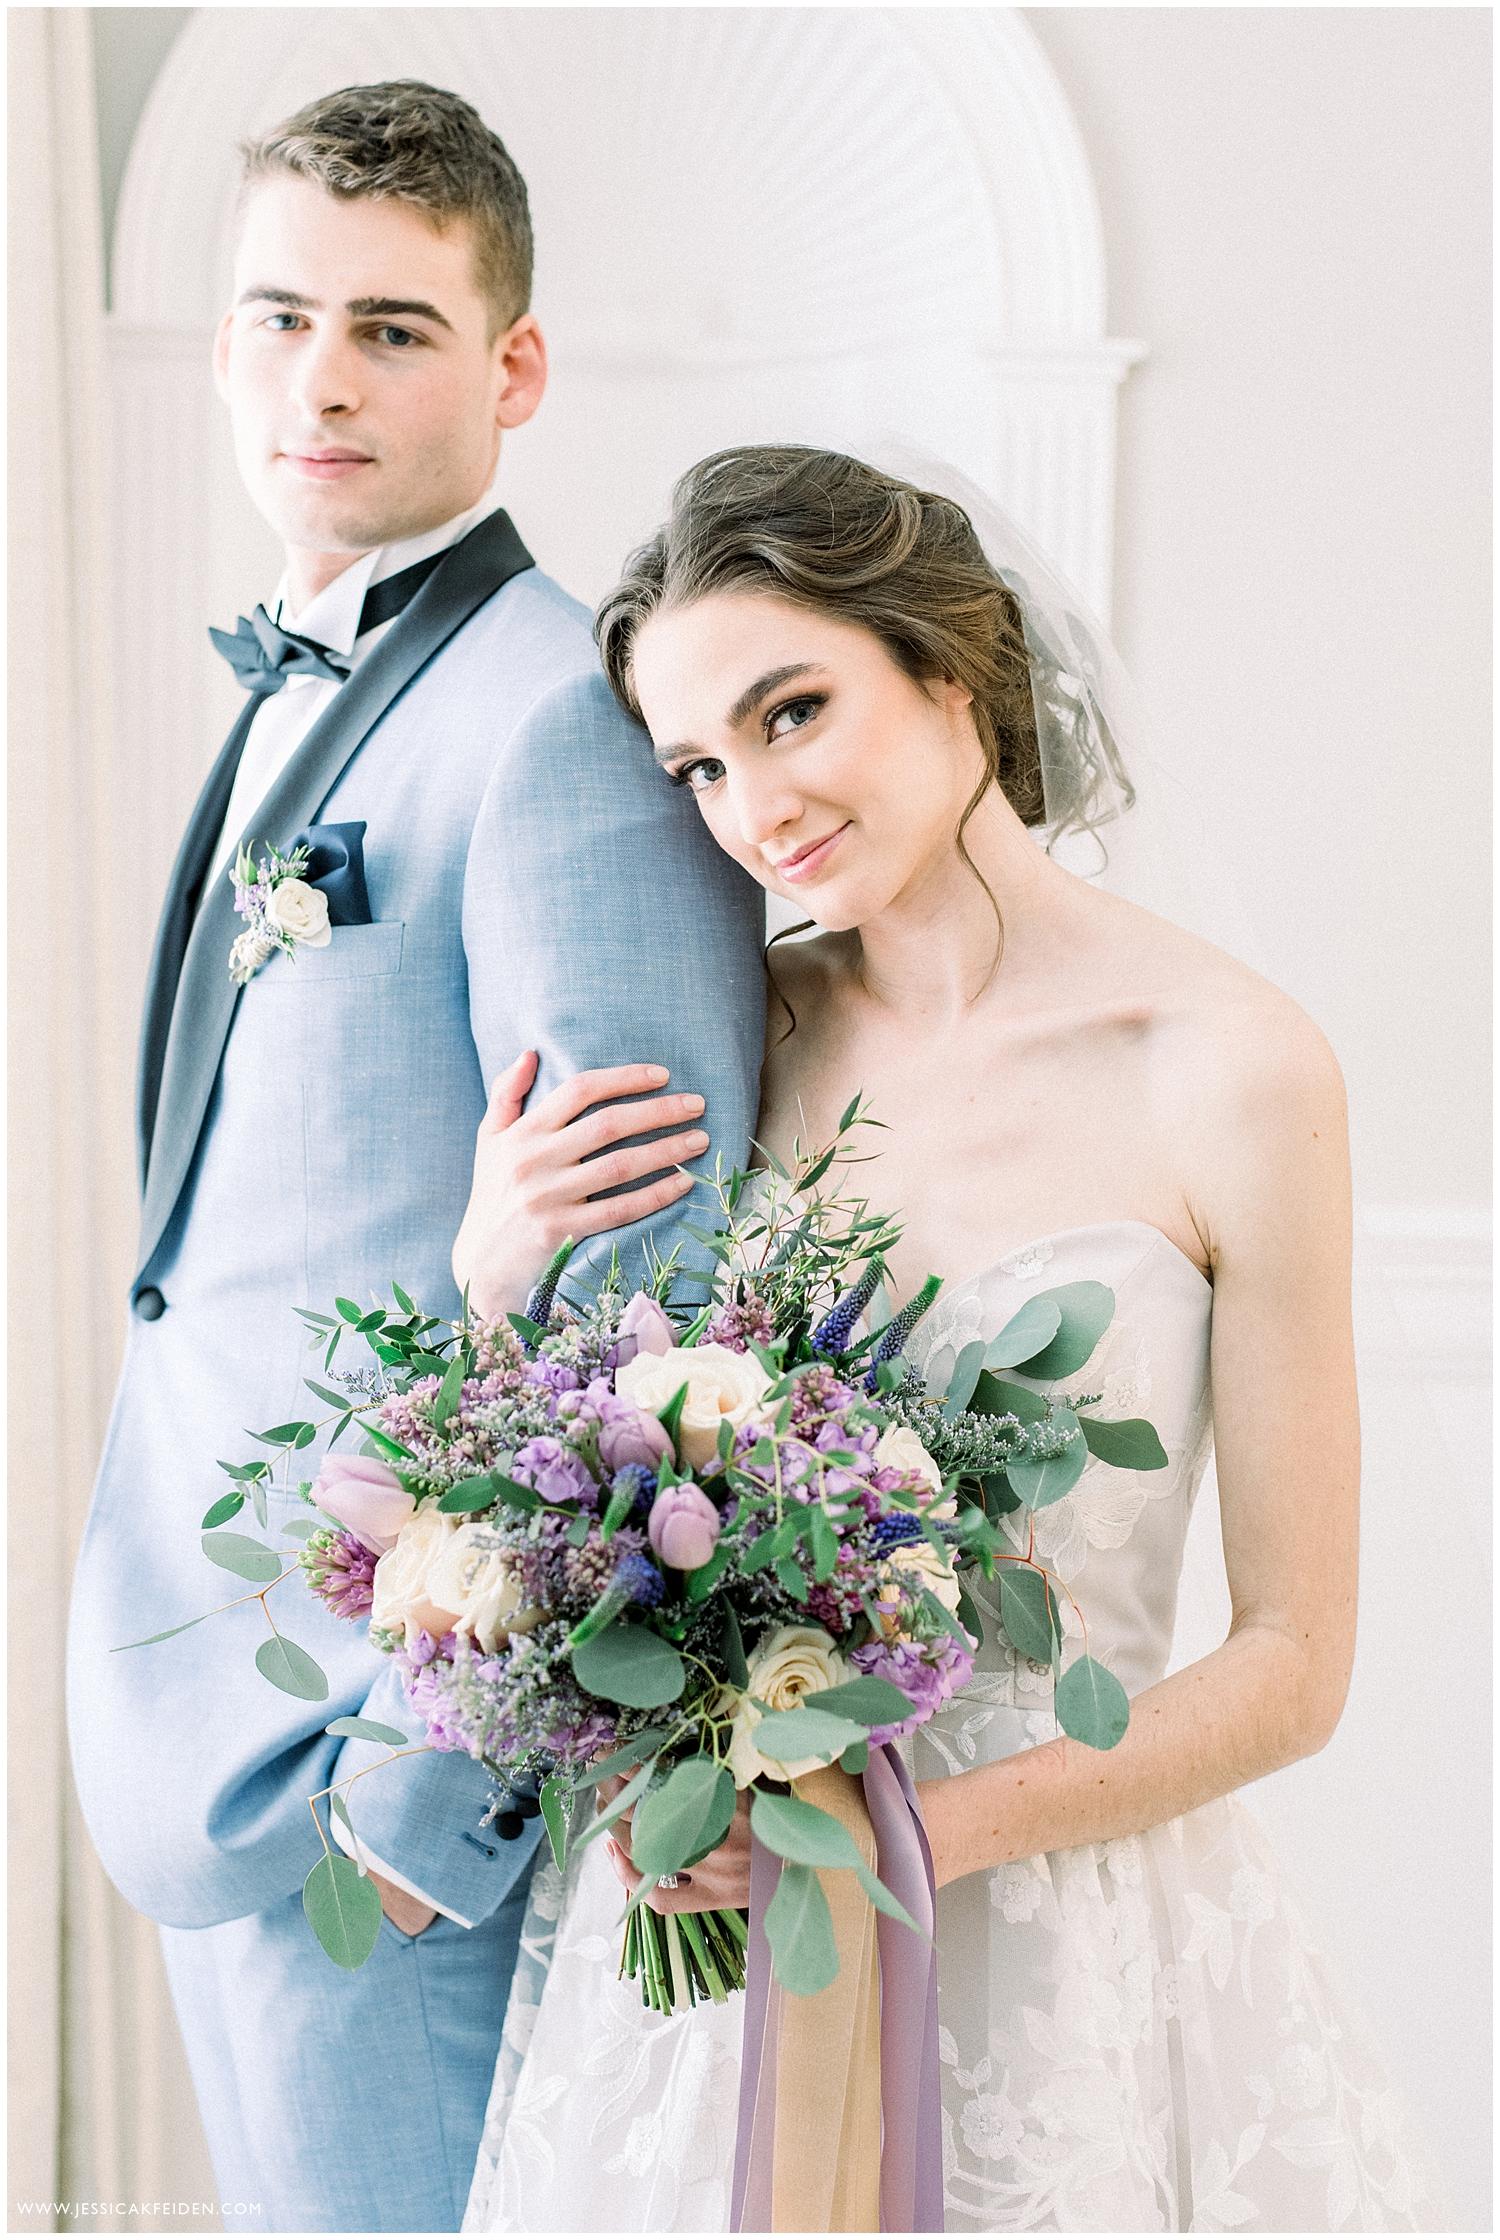 Jessica K Feiden Photography_The Commons 1854 Topsfield Wedding Photographer_0022.jpg